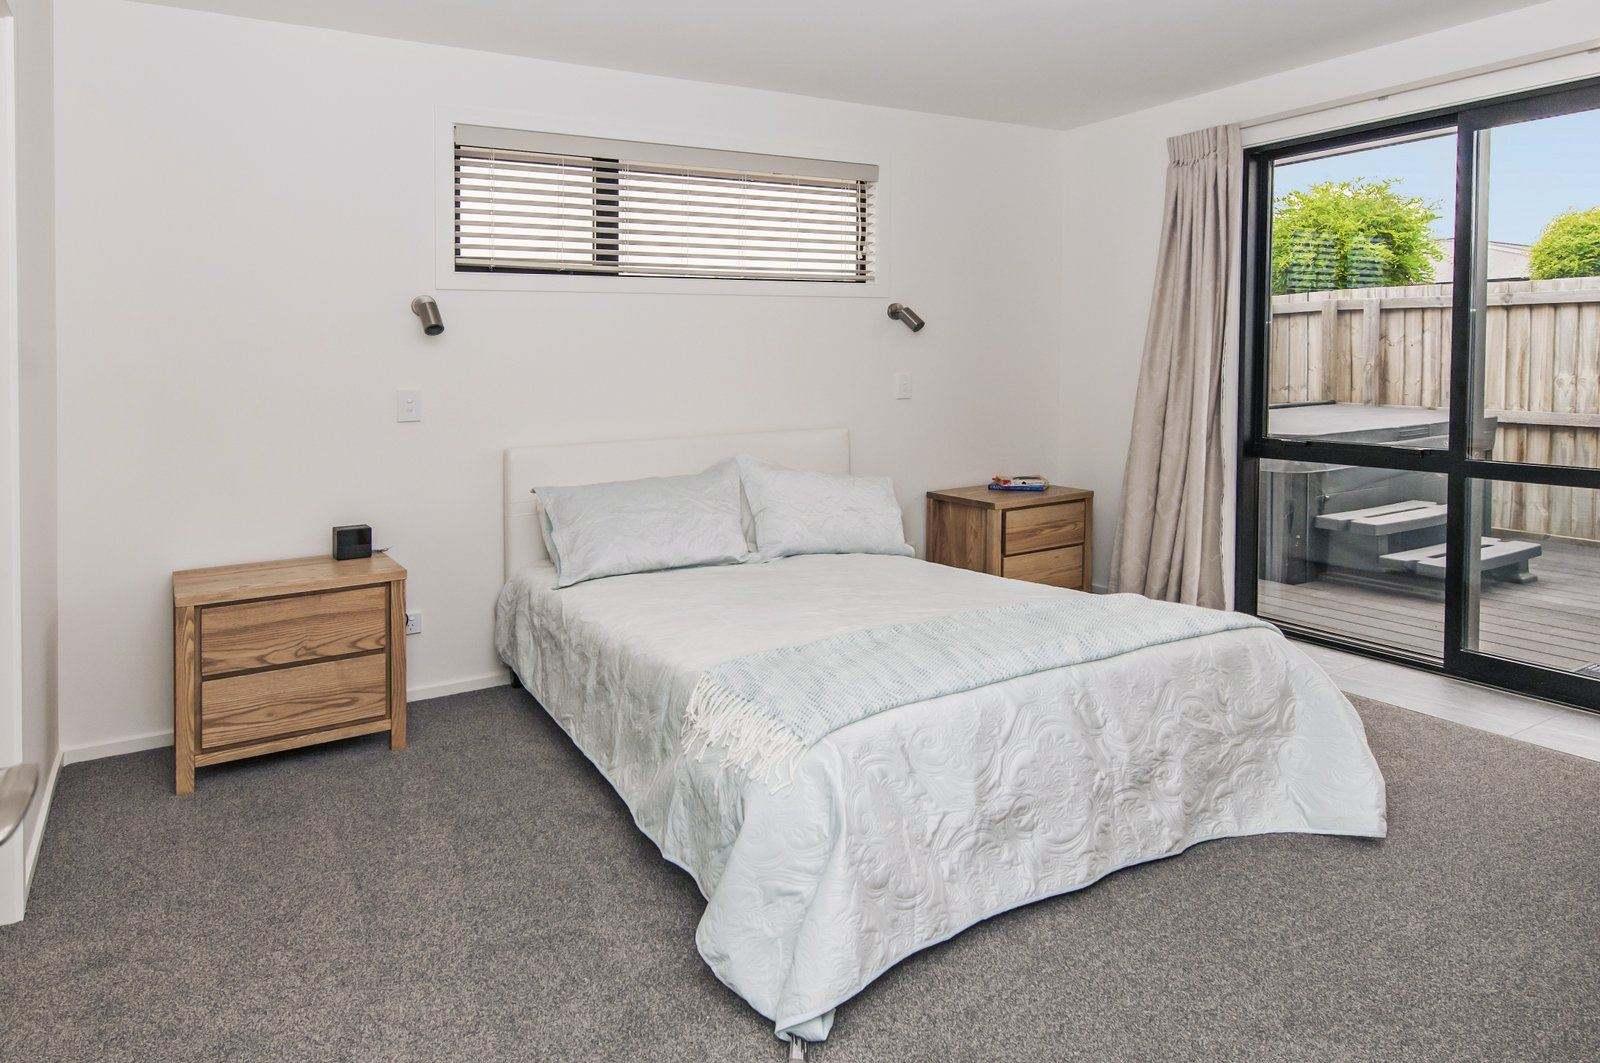 Waipukurau and Surrounds 3房 Options available to make the house your home!